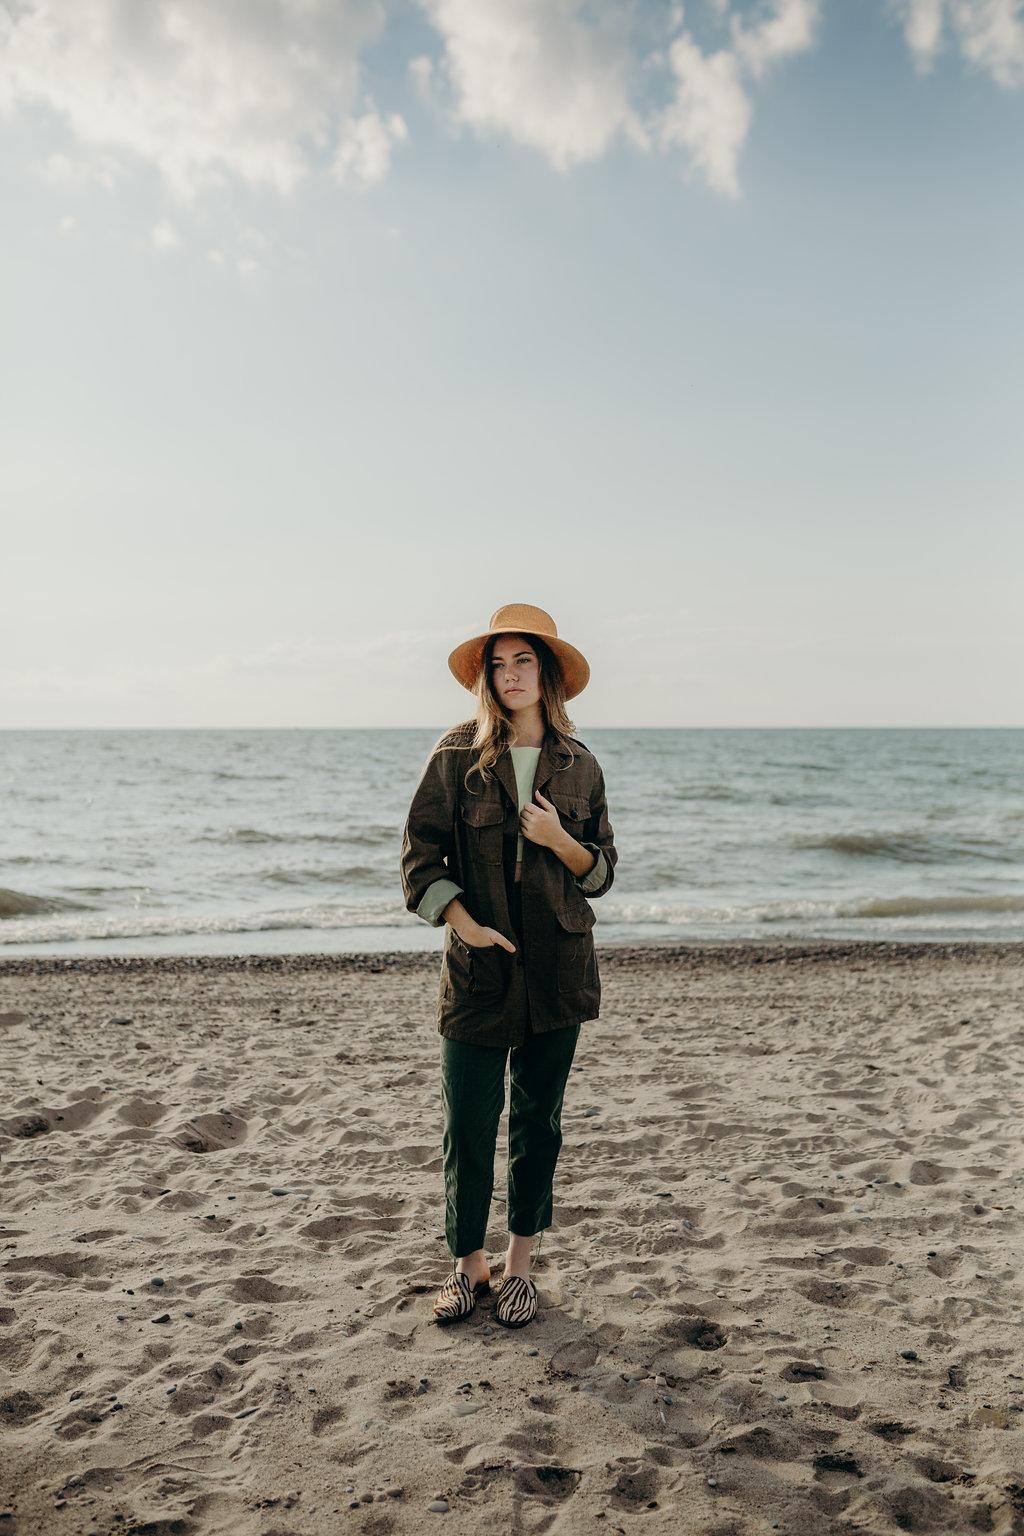 HEADLANDS BEACH OHIO | MAGAN 11